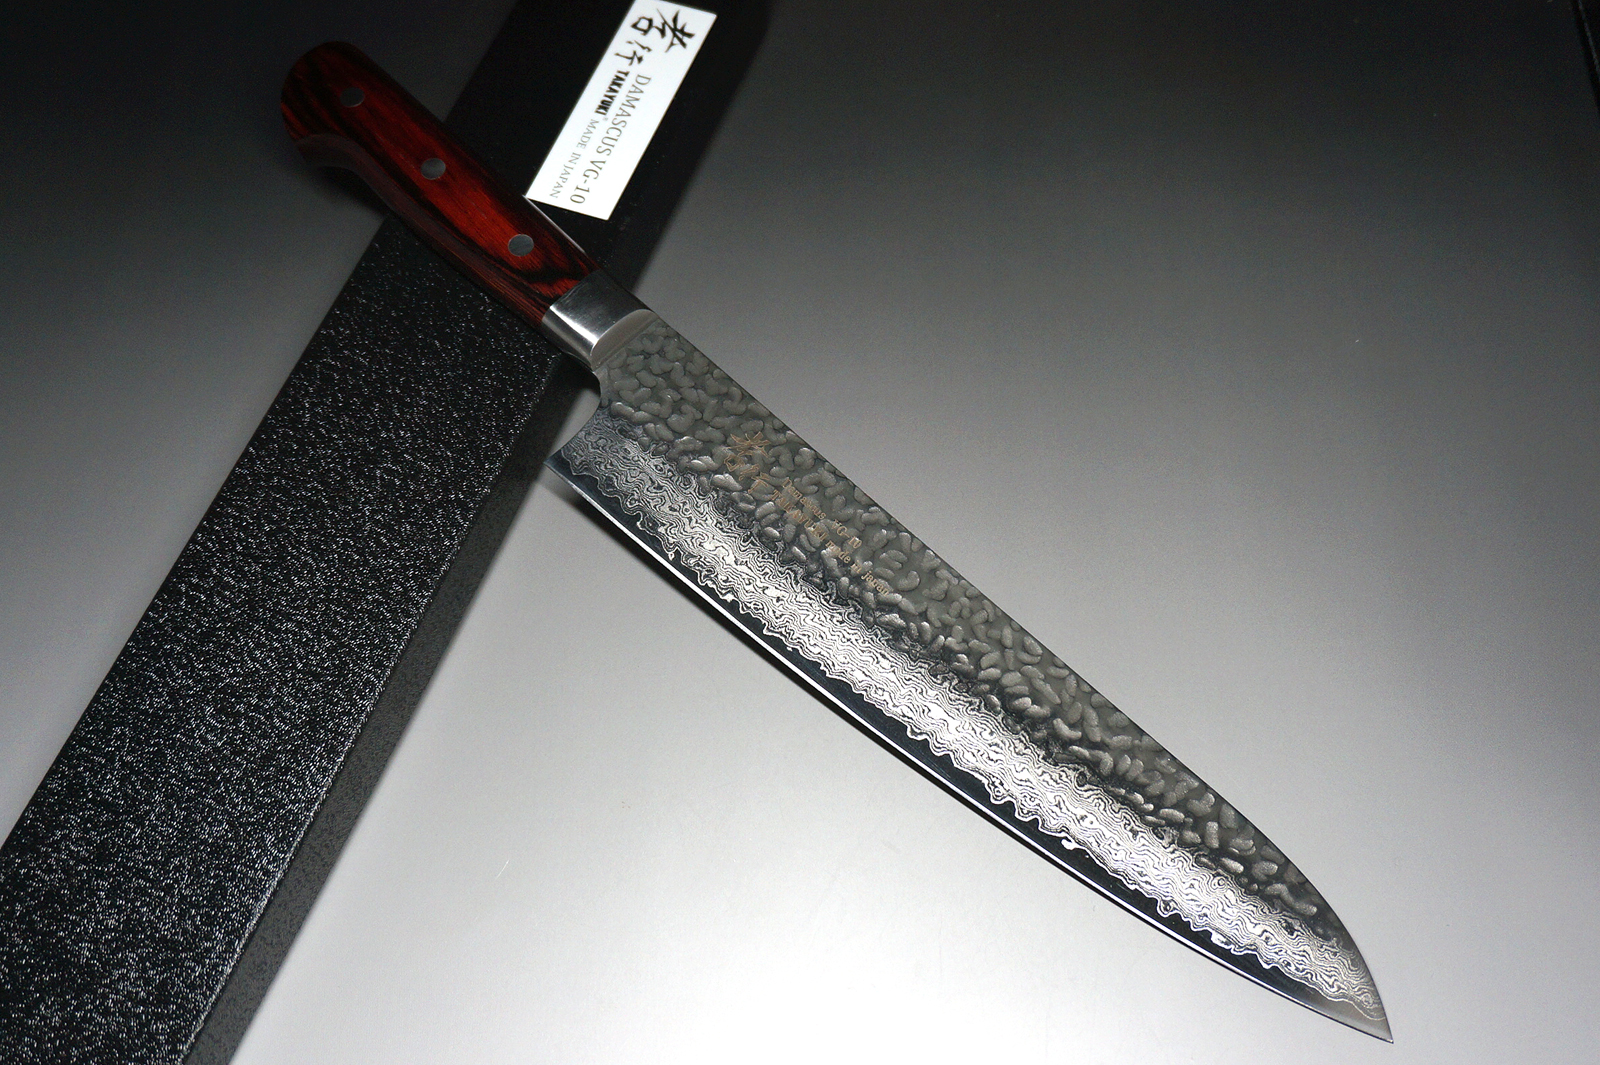 sakai takayuki 33 layer vg10 damascus hammered chef knife gyuto 240mm japan. Black Bedroom Furniture Sets. Home Design Ideas